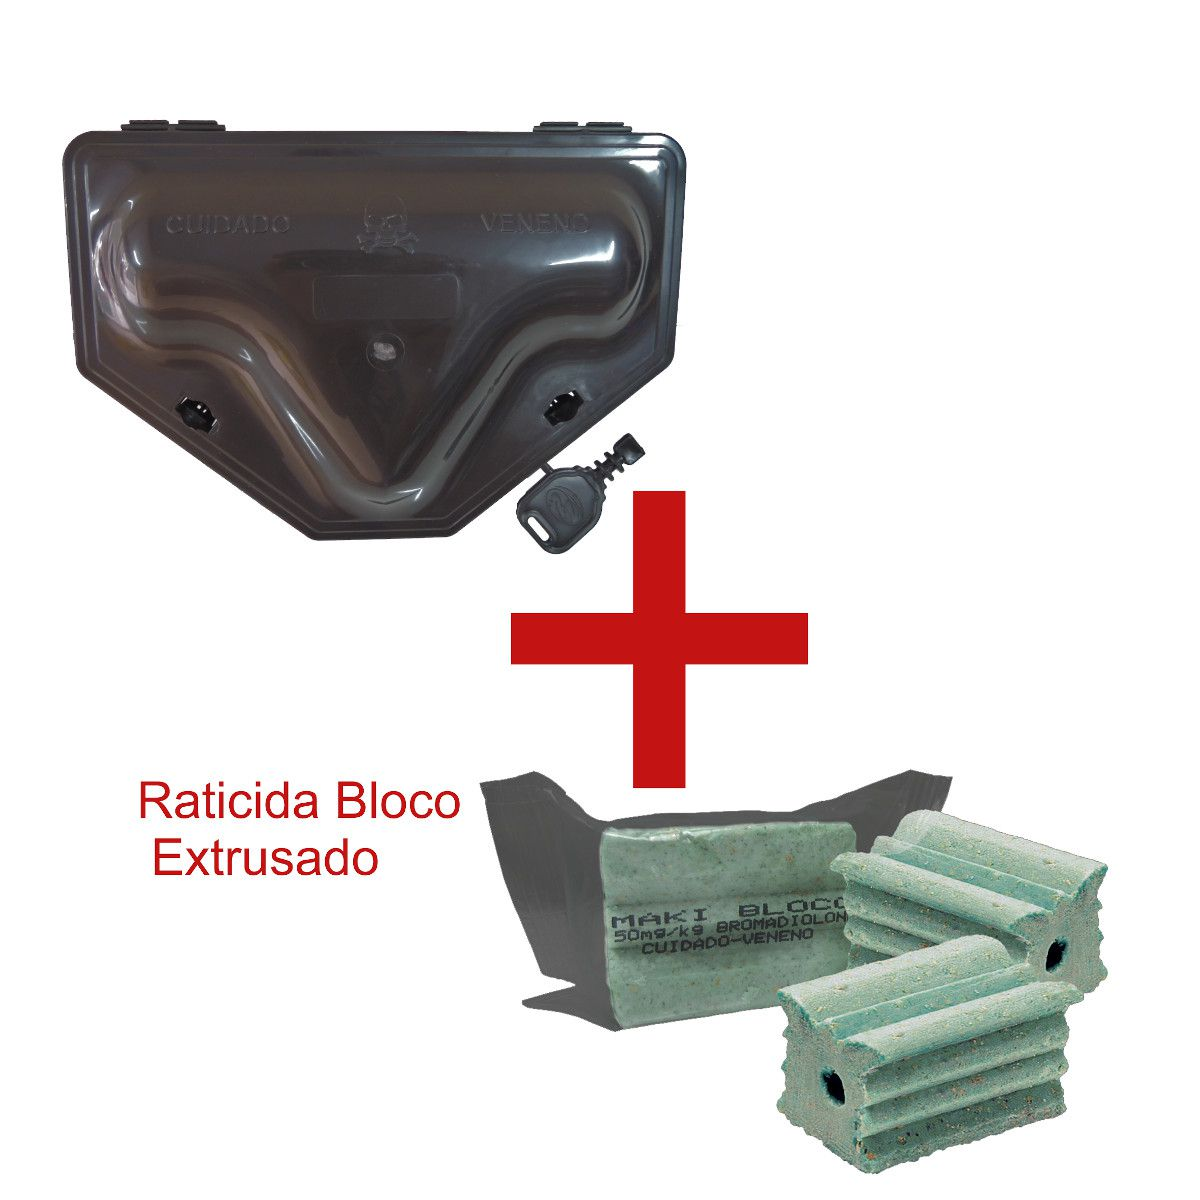 KIT 8 Porta Iscas Reforçado 2 TRAVAS Chave Ratoeira p/ ratos